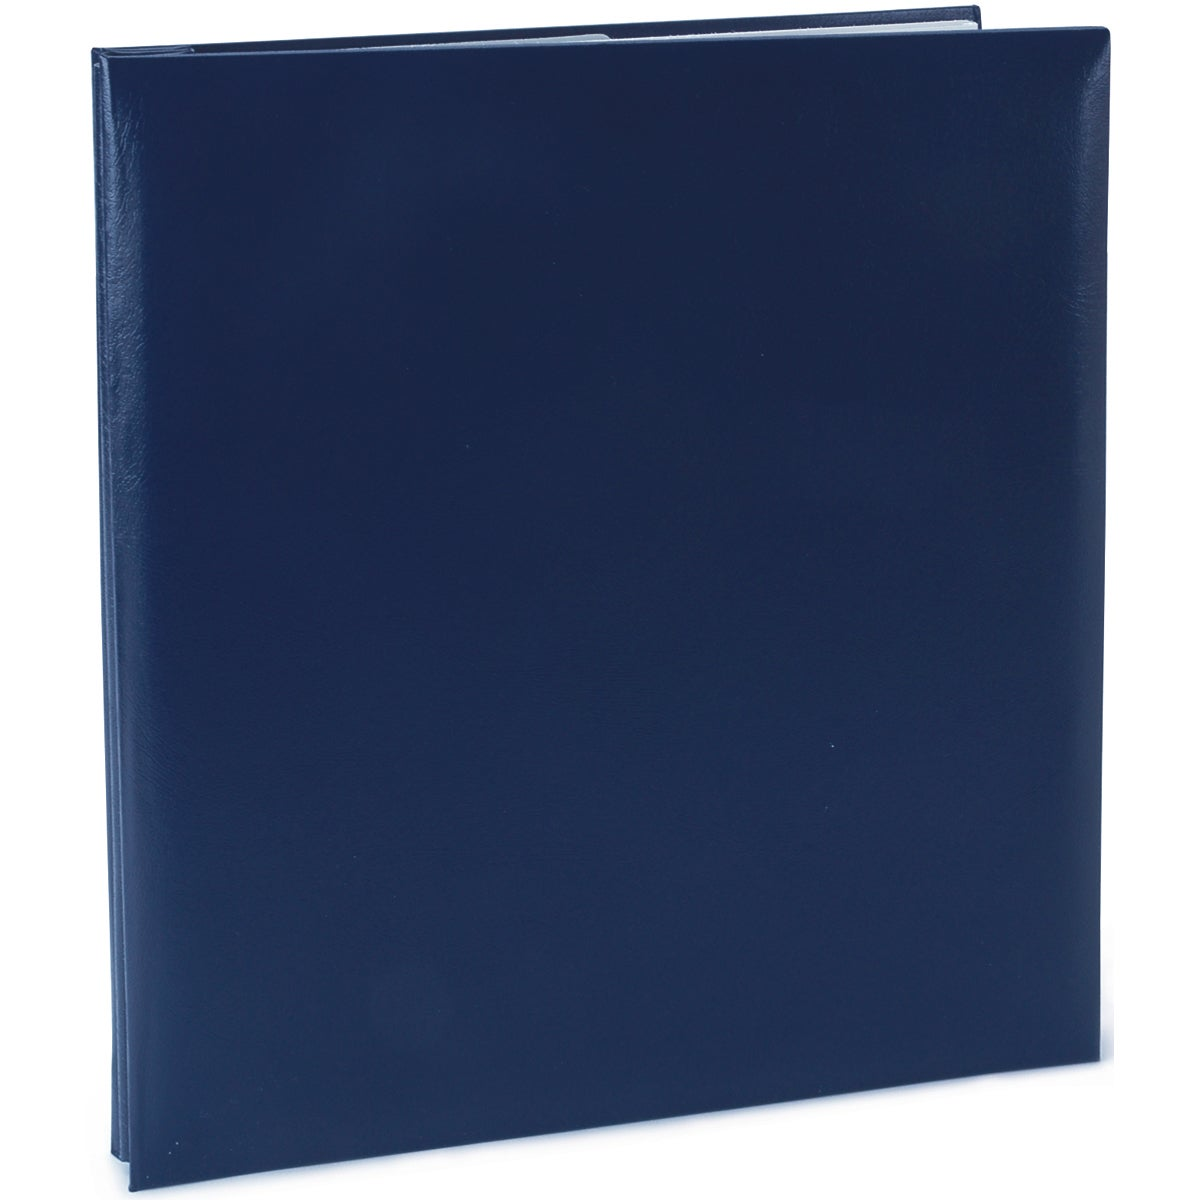 Pioneer Leatherette Post Bound Album 8.5inX11inNavy (Navy...